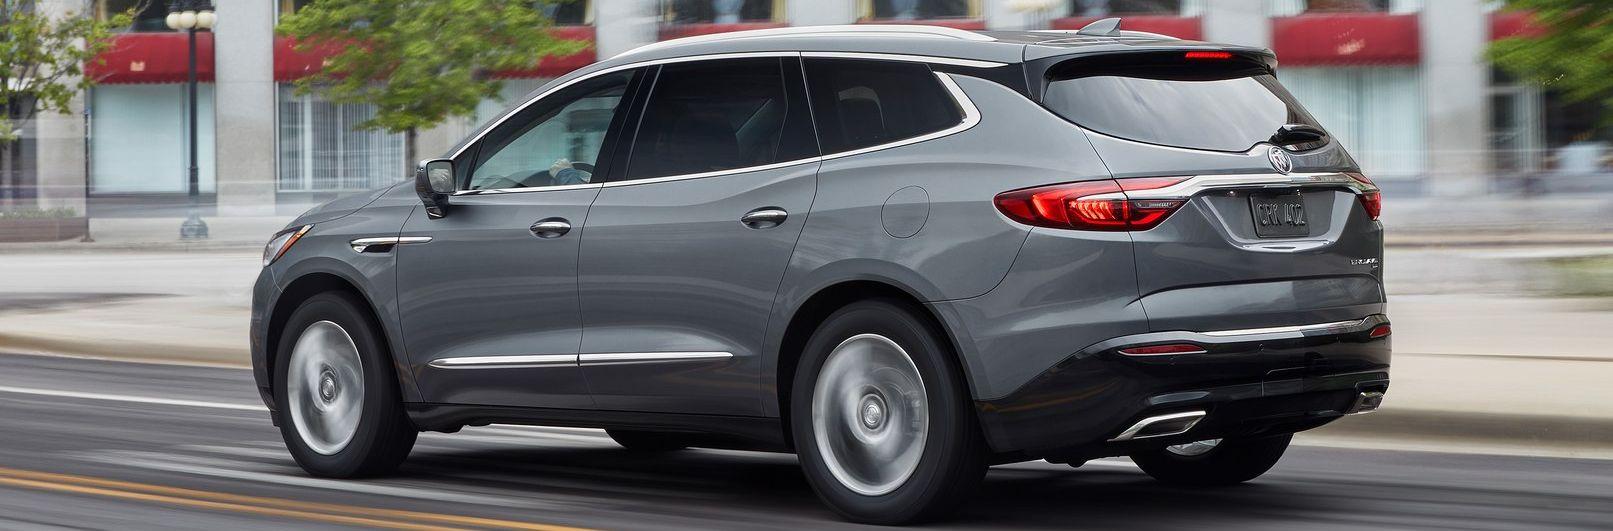 2019 Buick Enclave for Sale near Saksatoon, SK